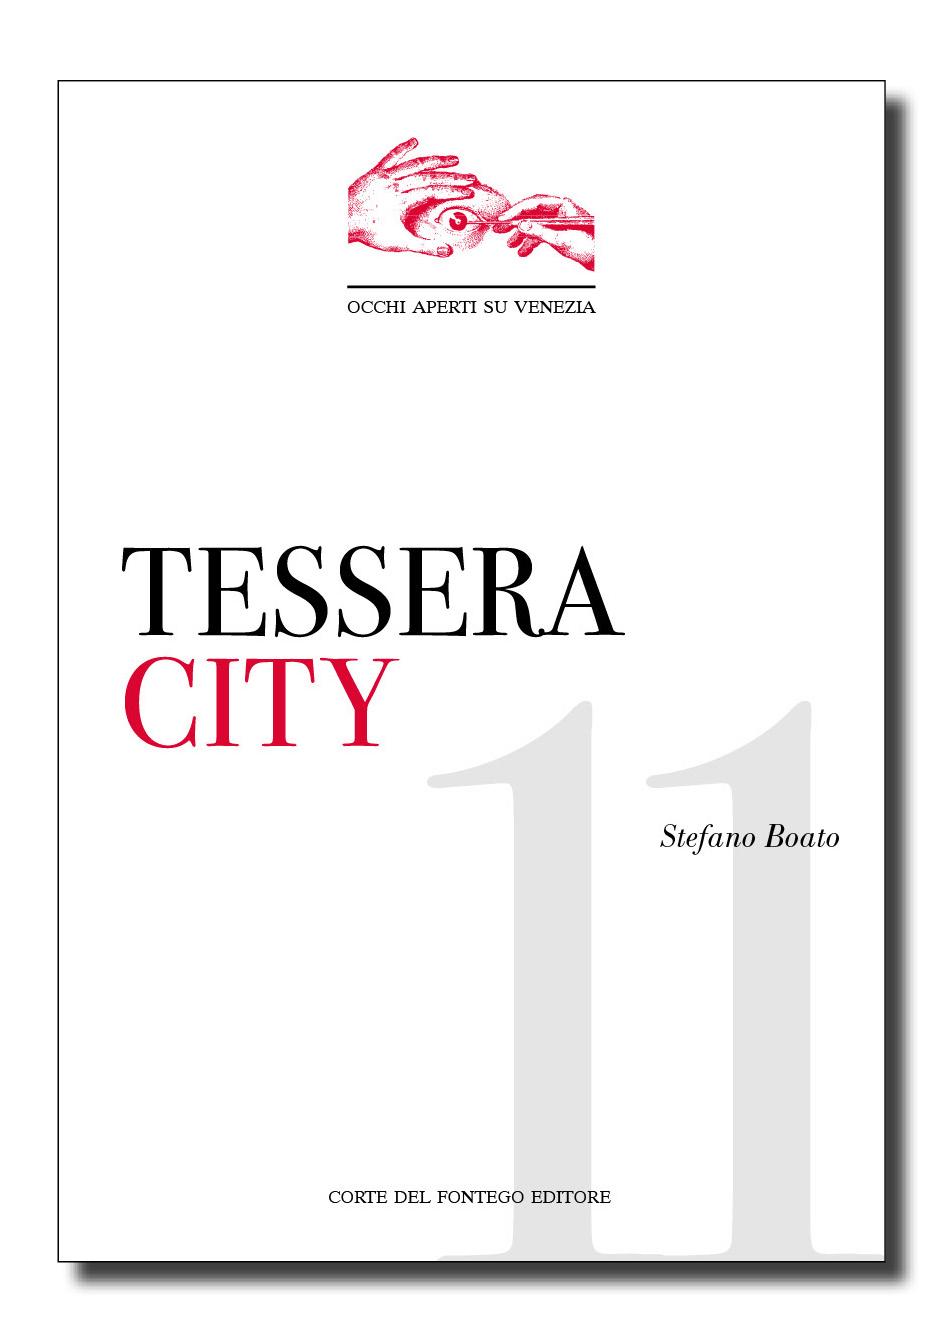 Tessera city